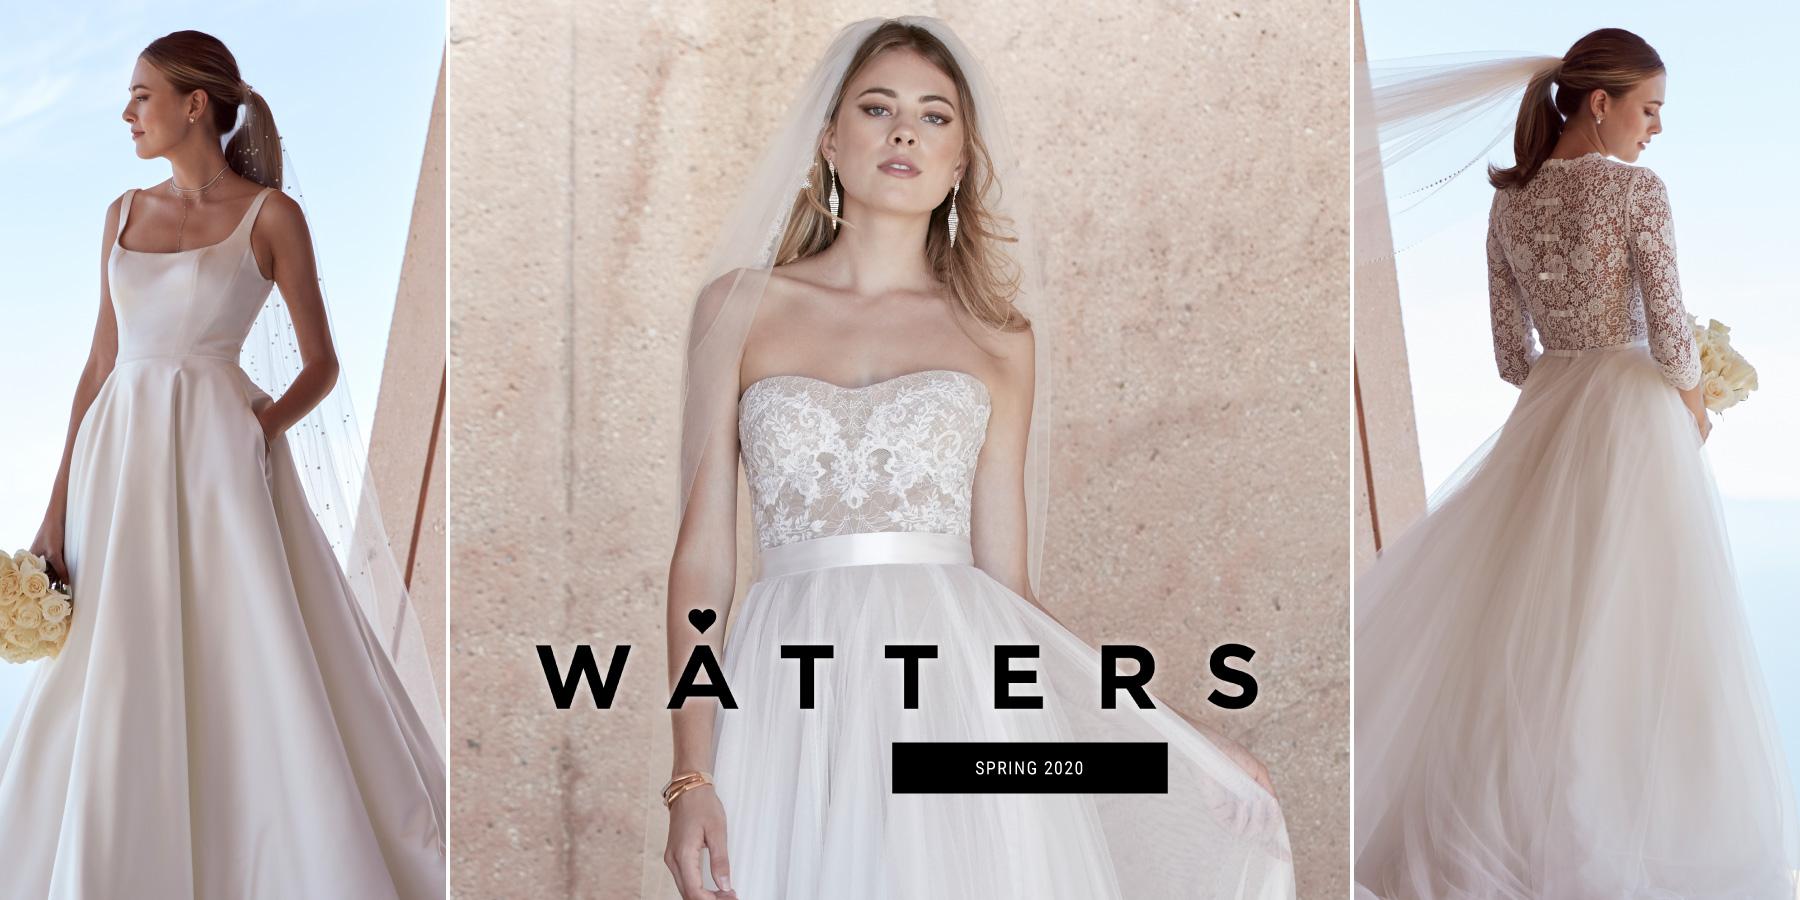 Watters Brides